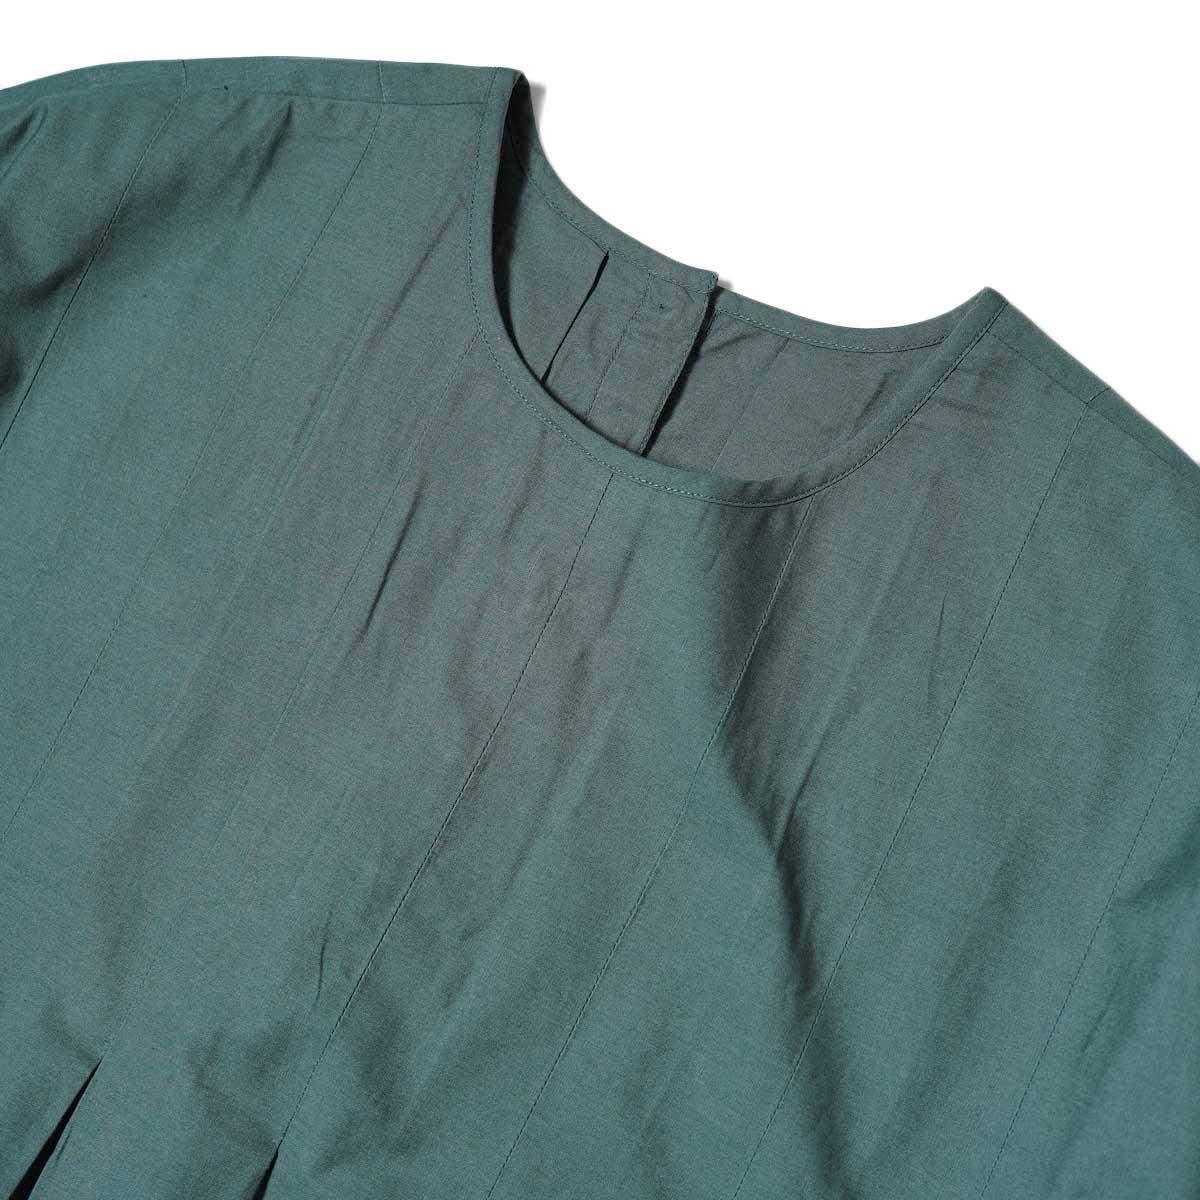 maison de soil / INVERTED PLEAT CREW-NECK P/O DRESS (Dk. Green) フロント